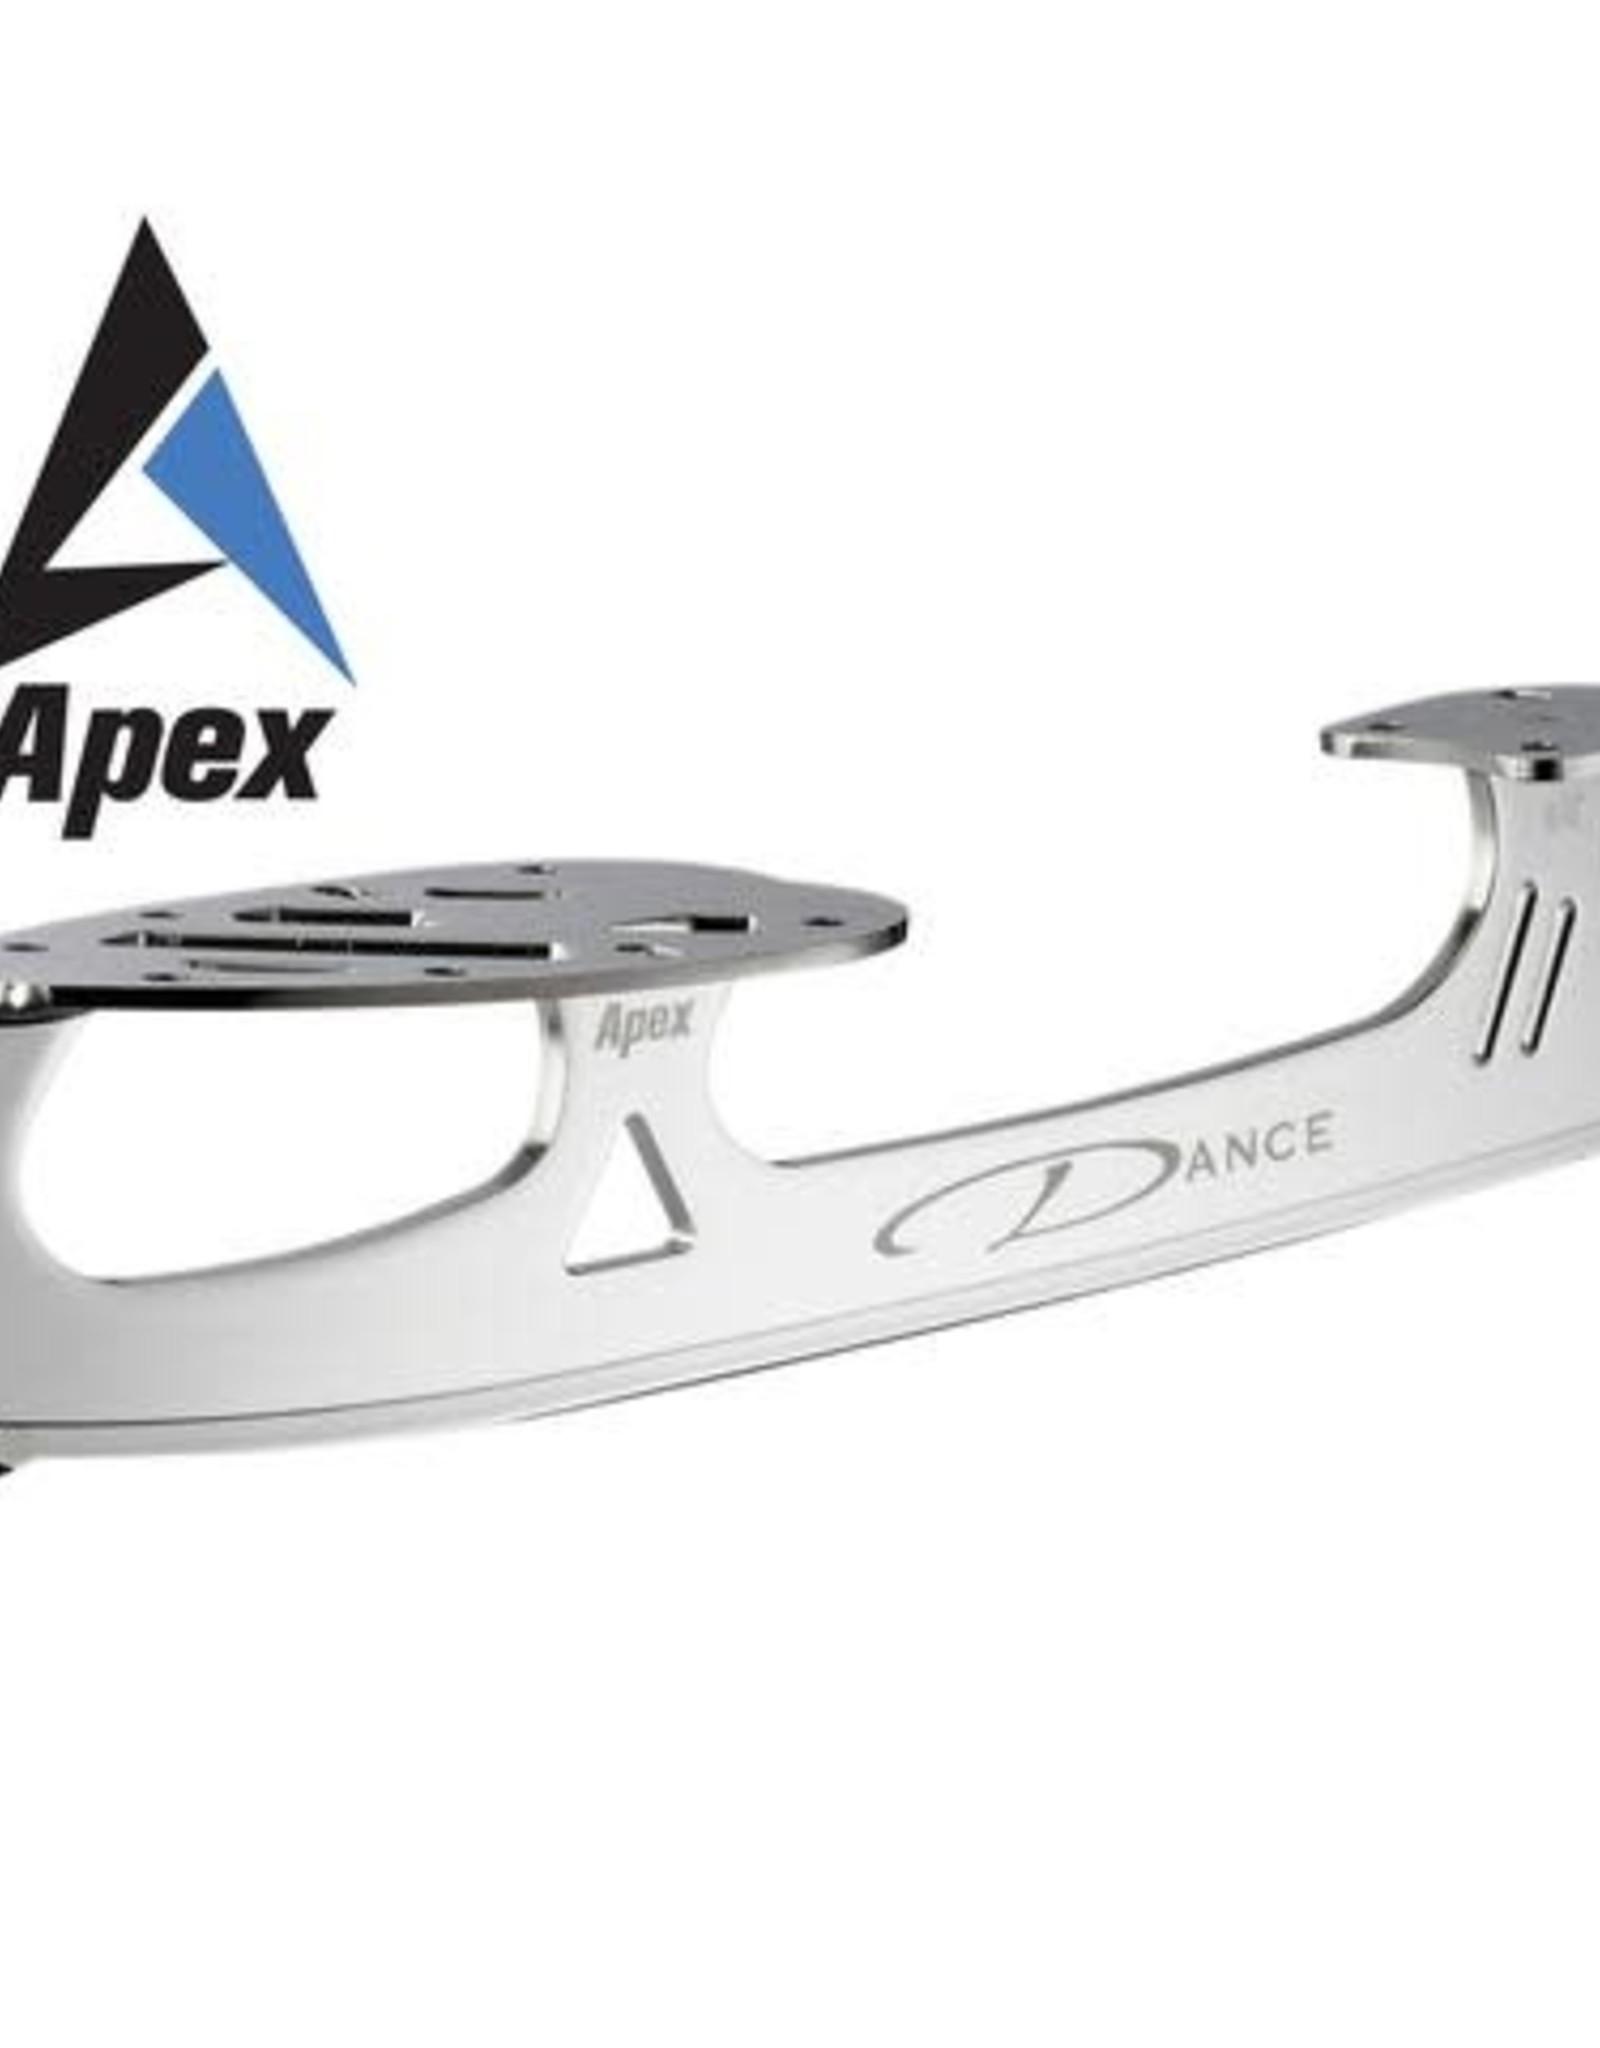 Jackson Apex Dance ijzer